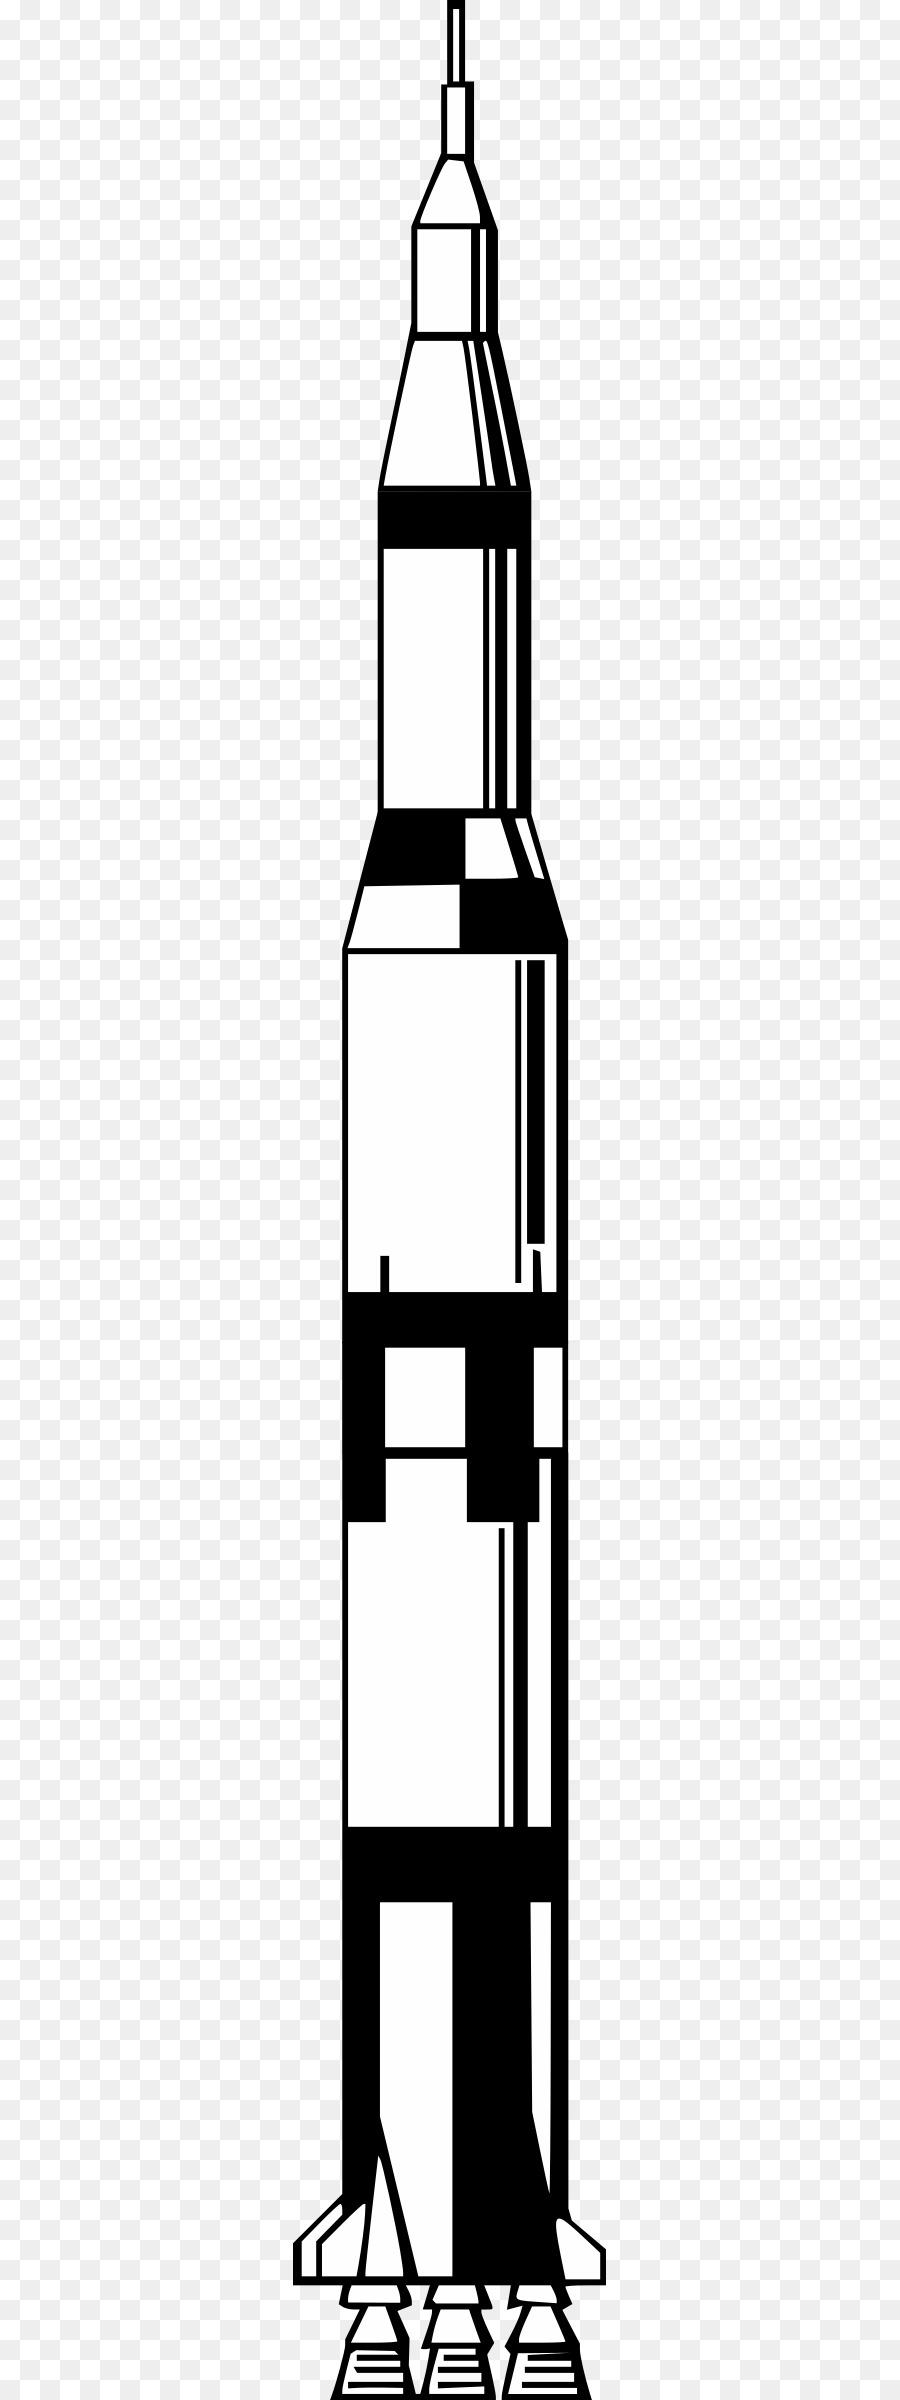 Clipart rocket apollo 13. Saturn background line